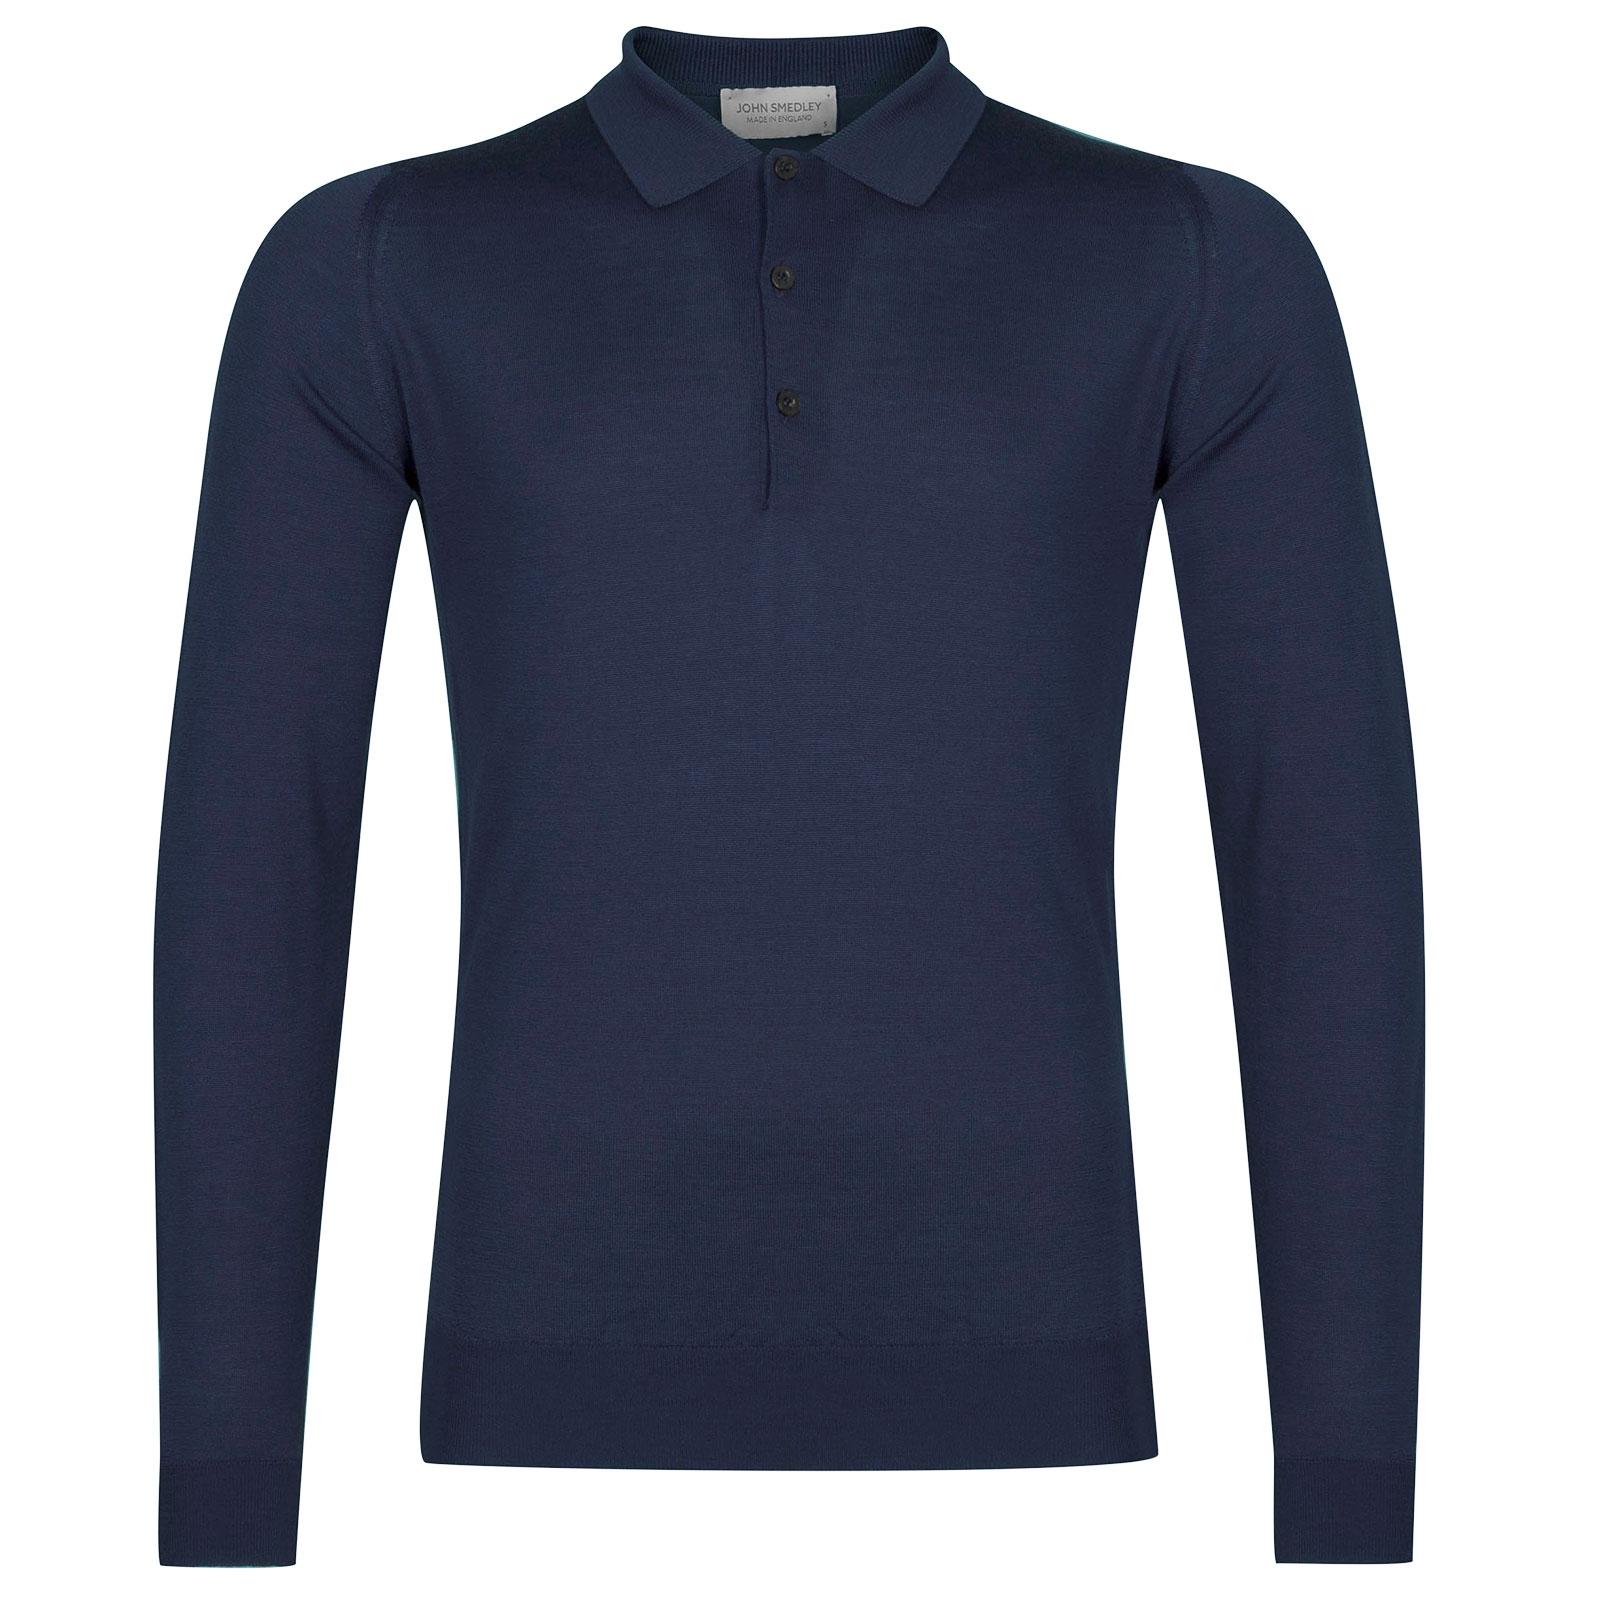 John Smedley Belper Merino Wool Shirt in Magnetic Cobalt-L